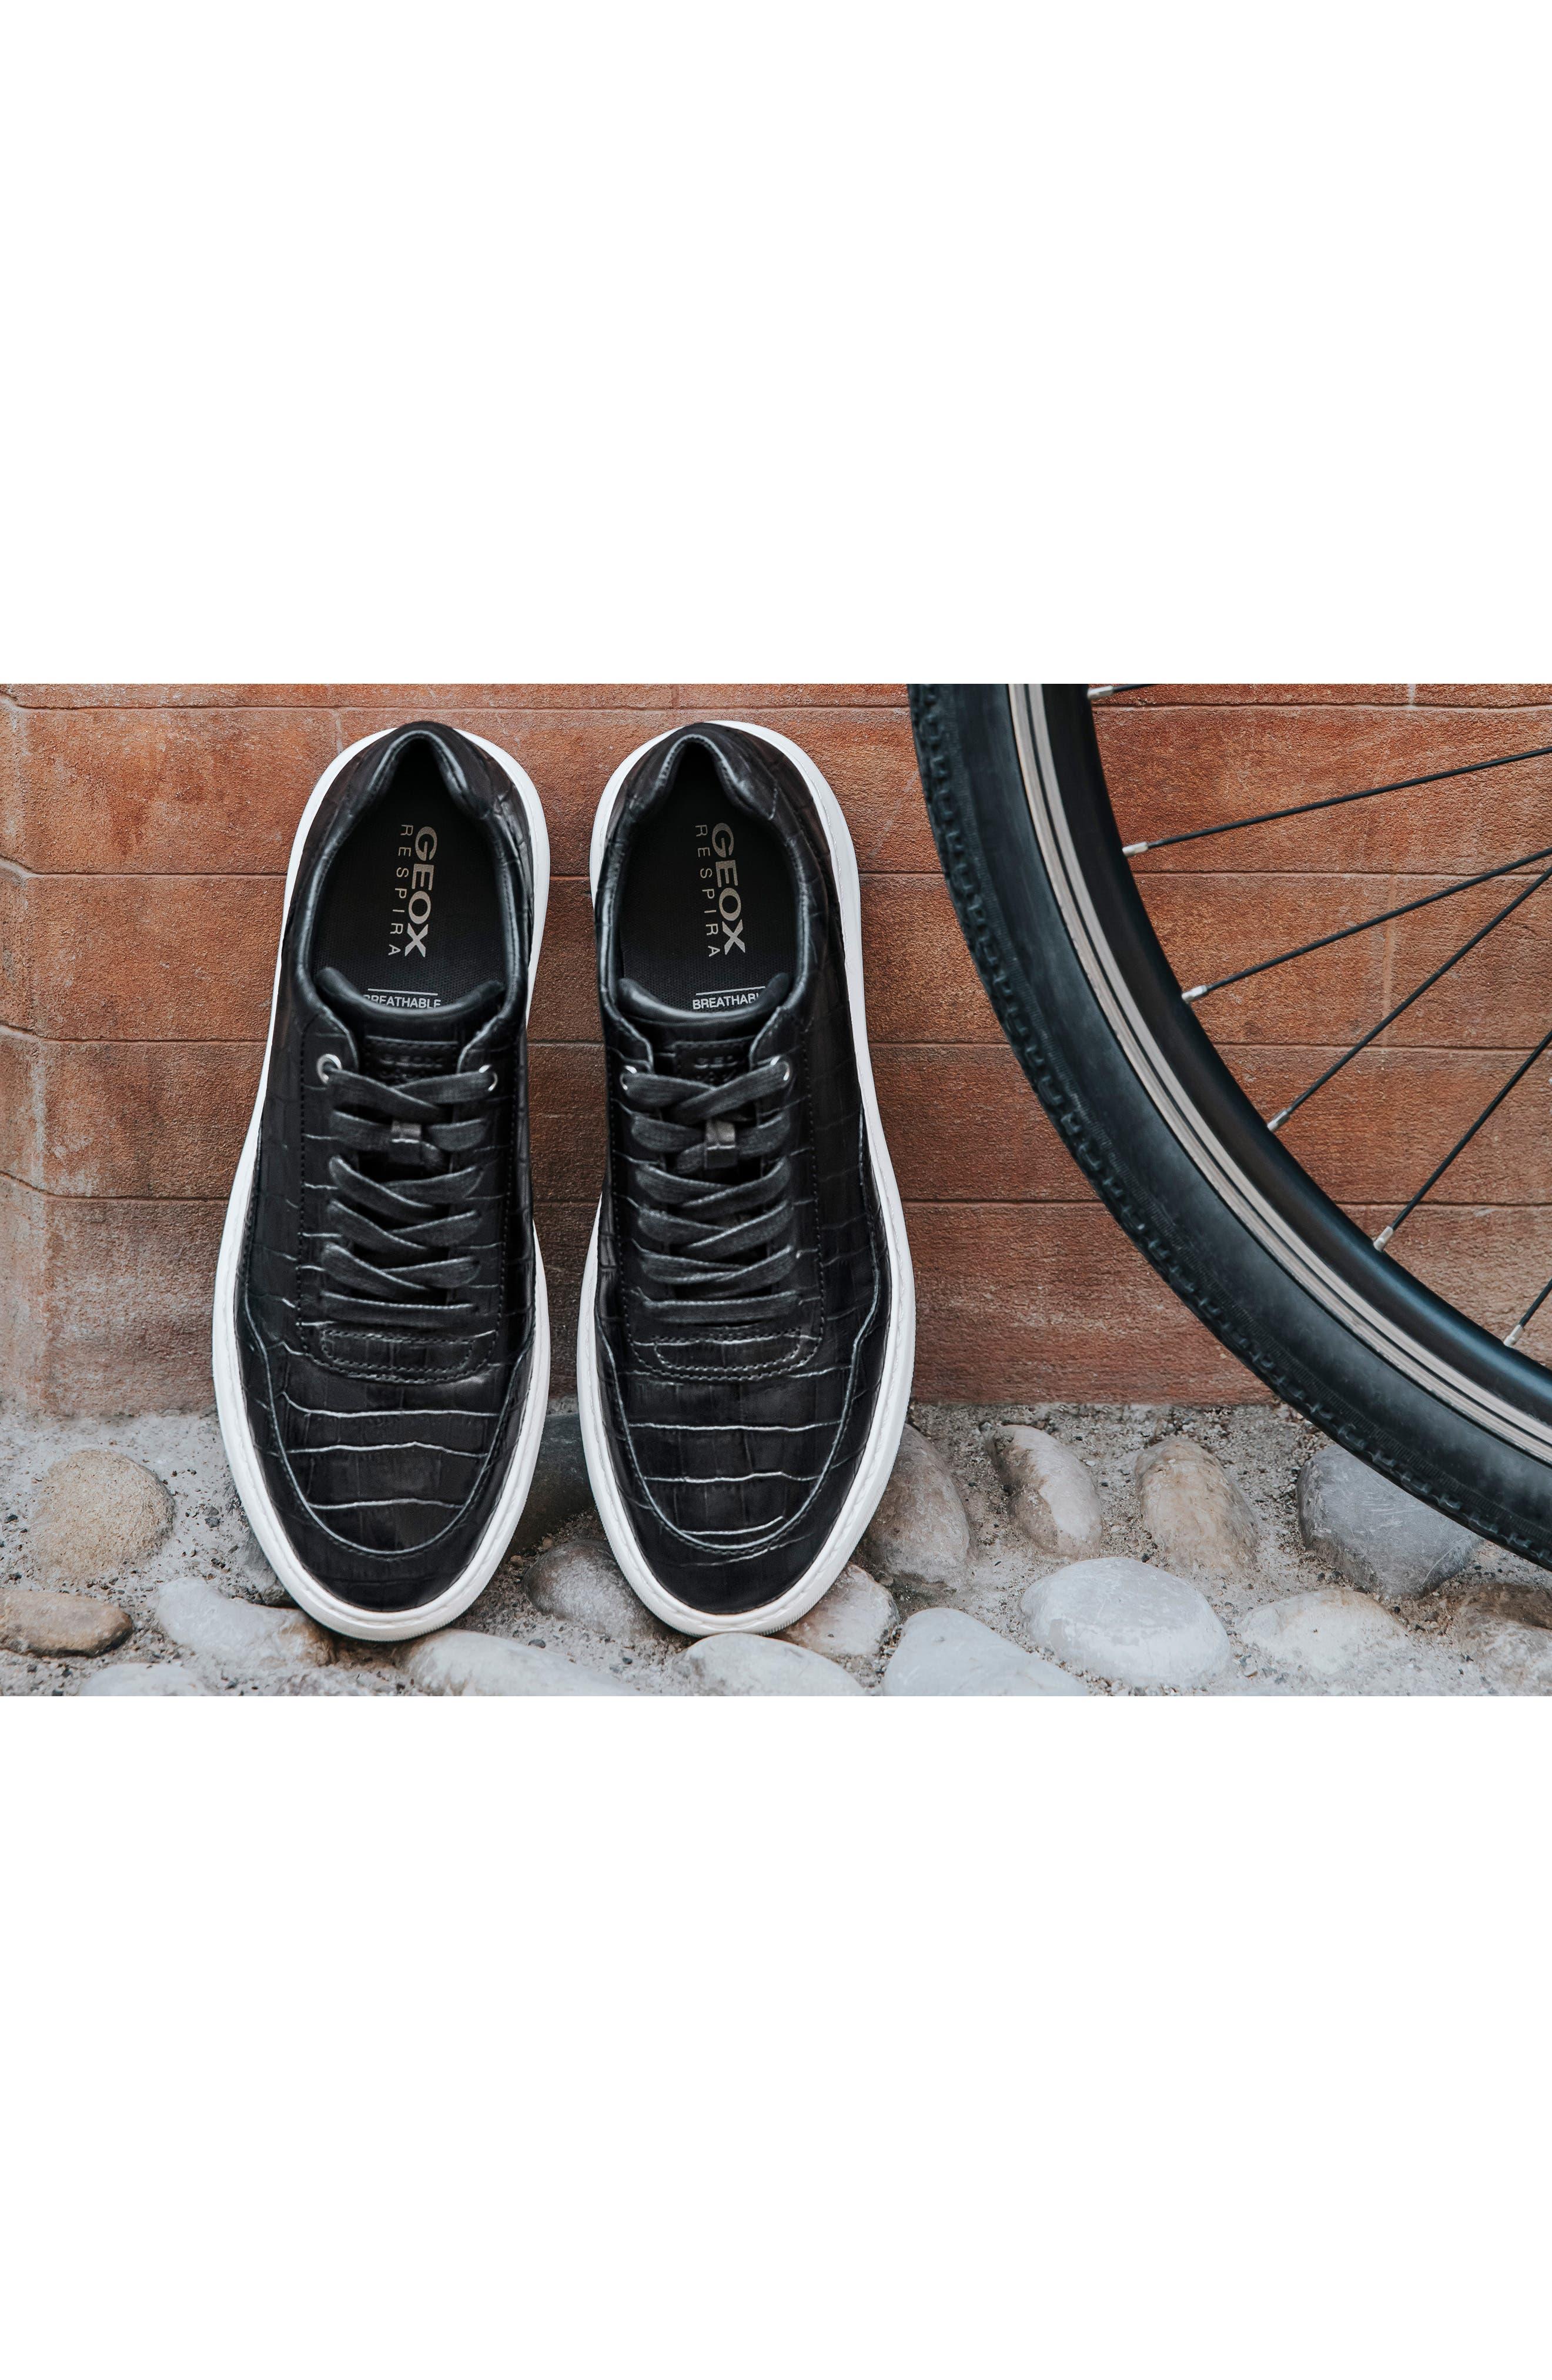 Deiven 8 Croc Textured Low Top Sneaker,                             Alternate thumbnail 9, color,                             BLACK LEATHER